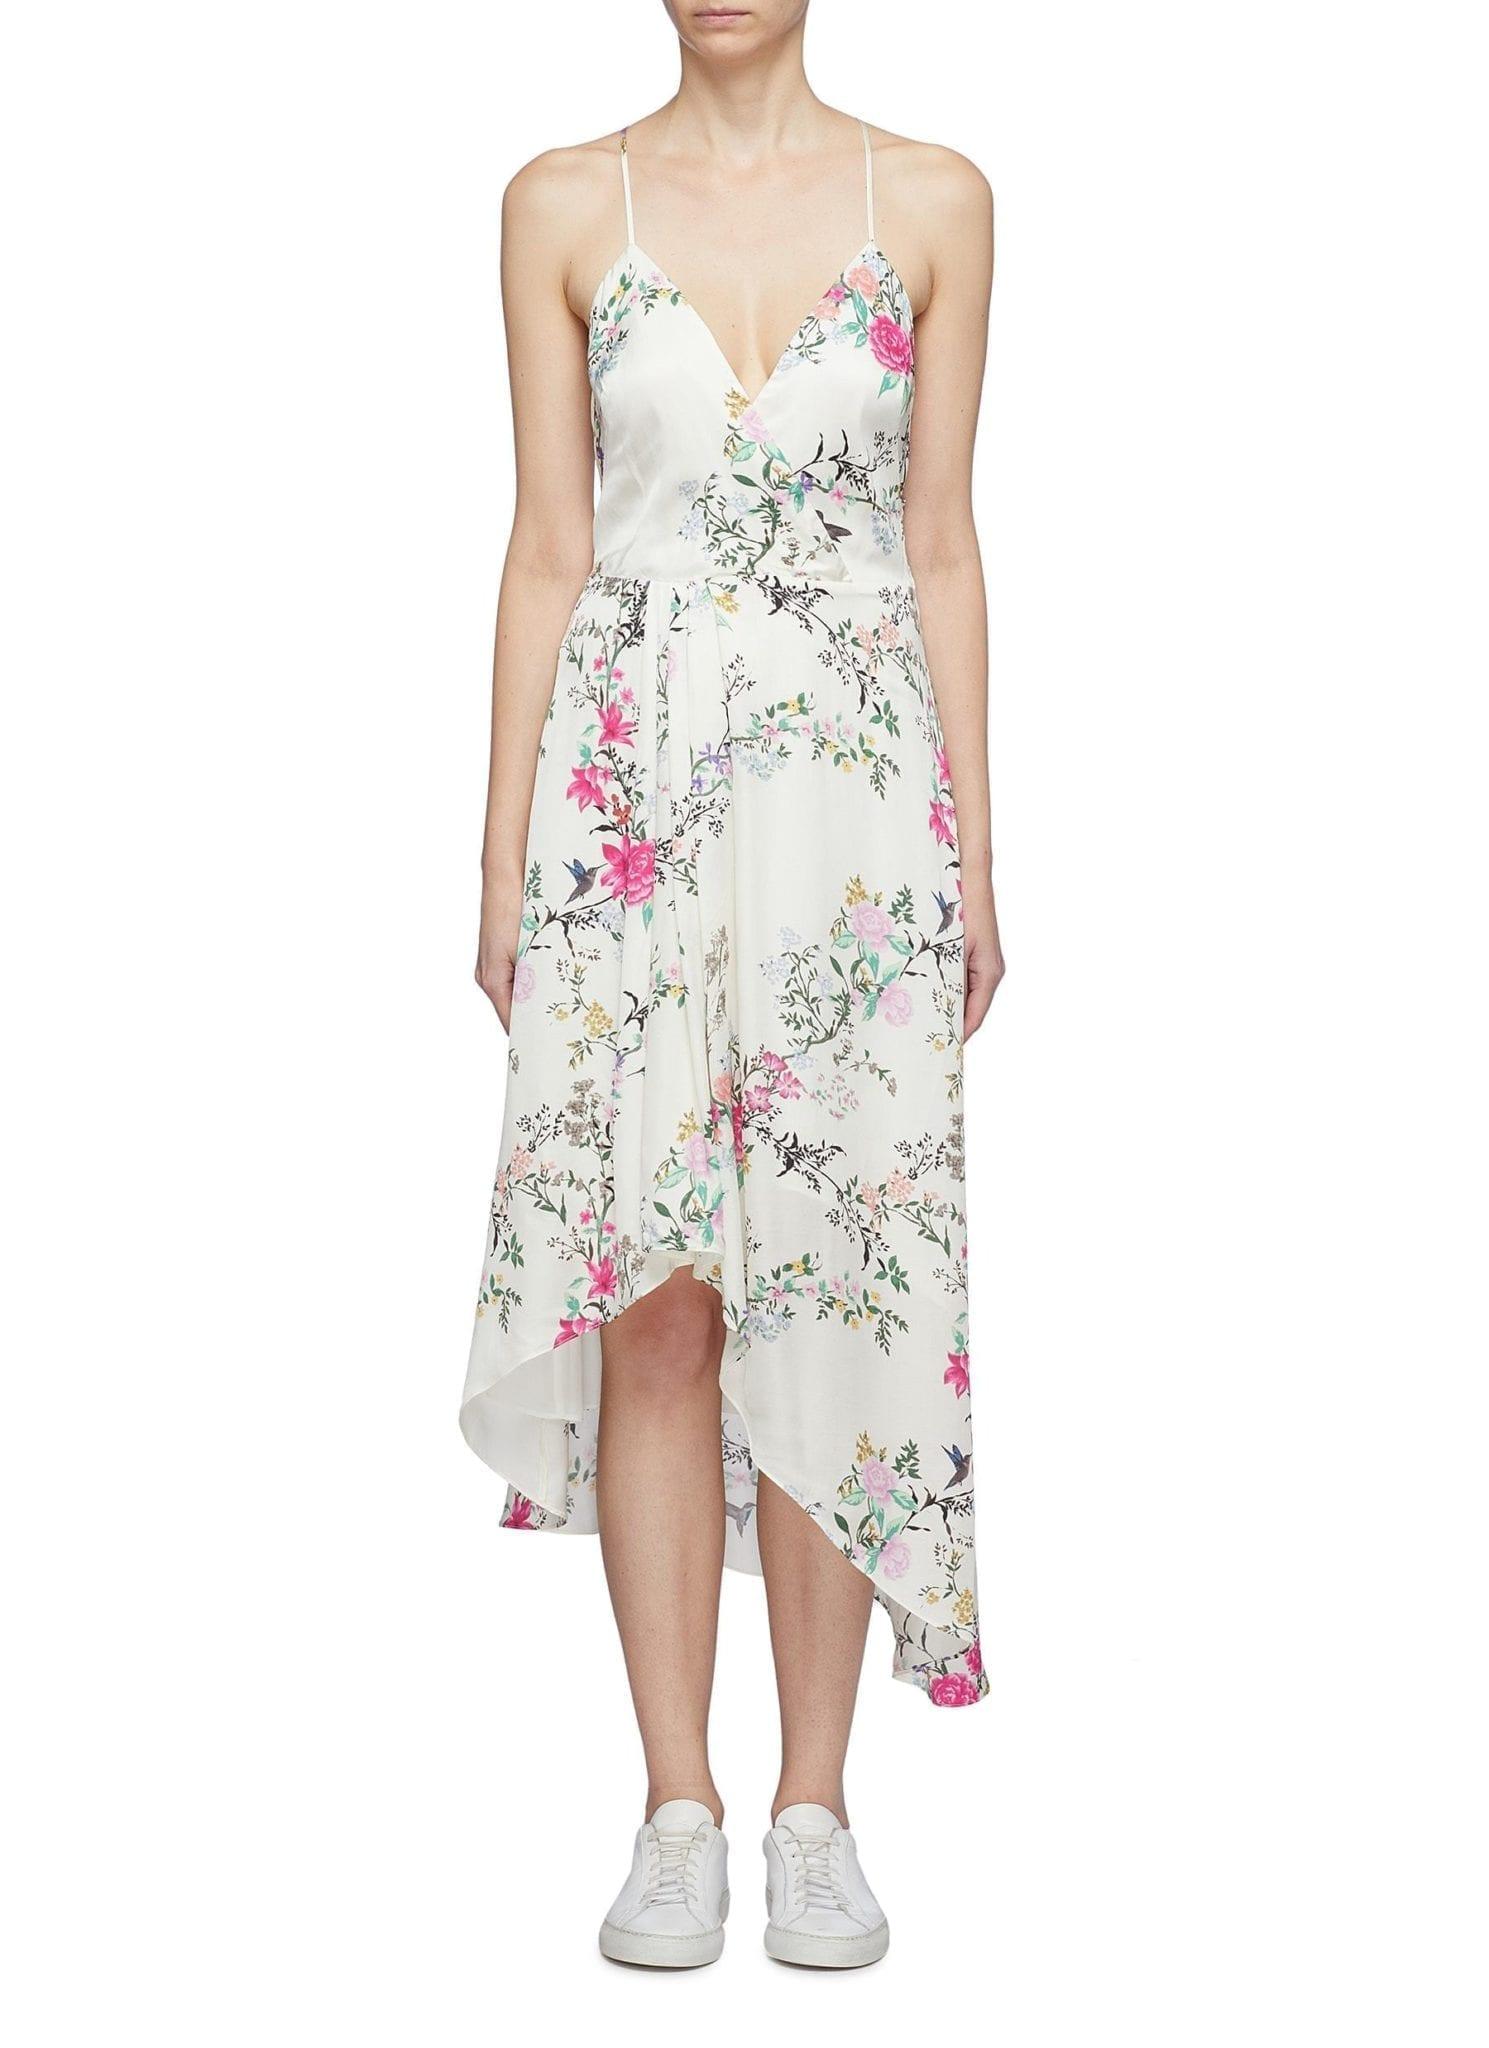 EQUIPMENT X Tabitha Simmons 'estille' Floral Print High-low Slip White Dress